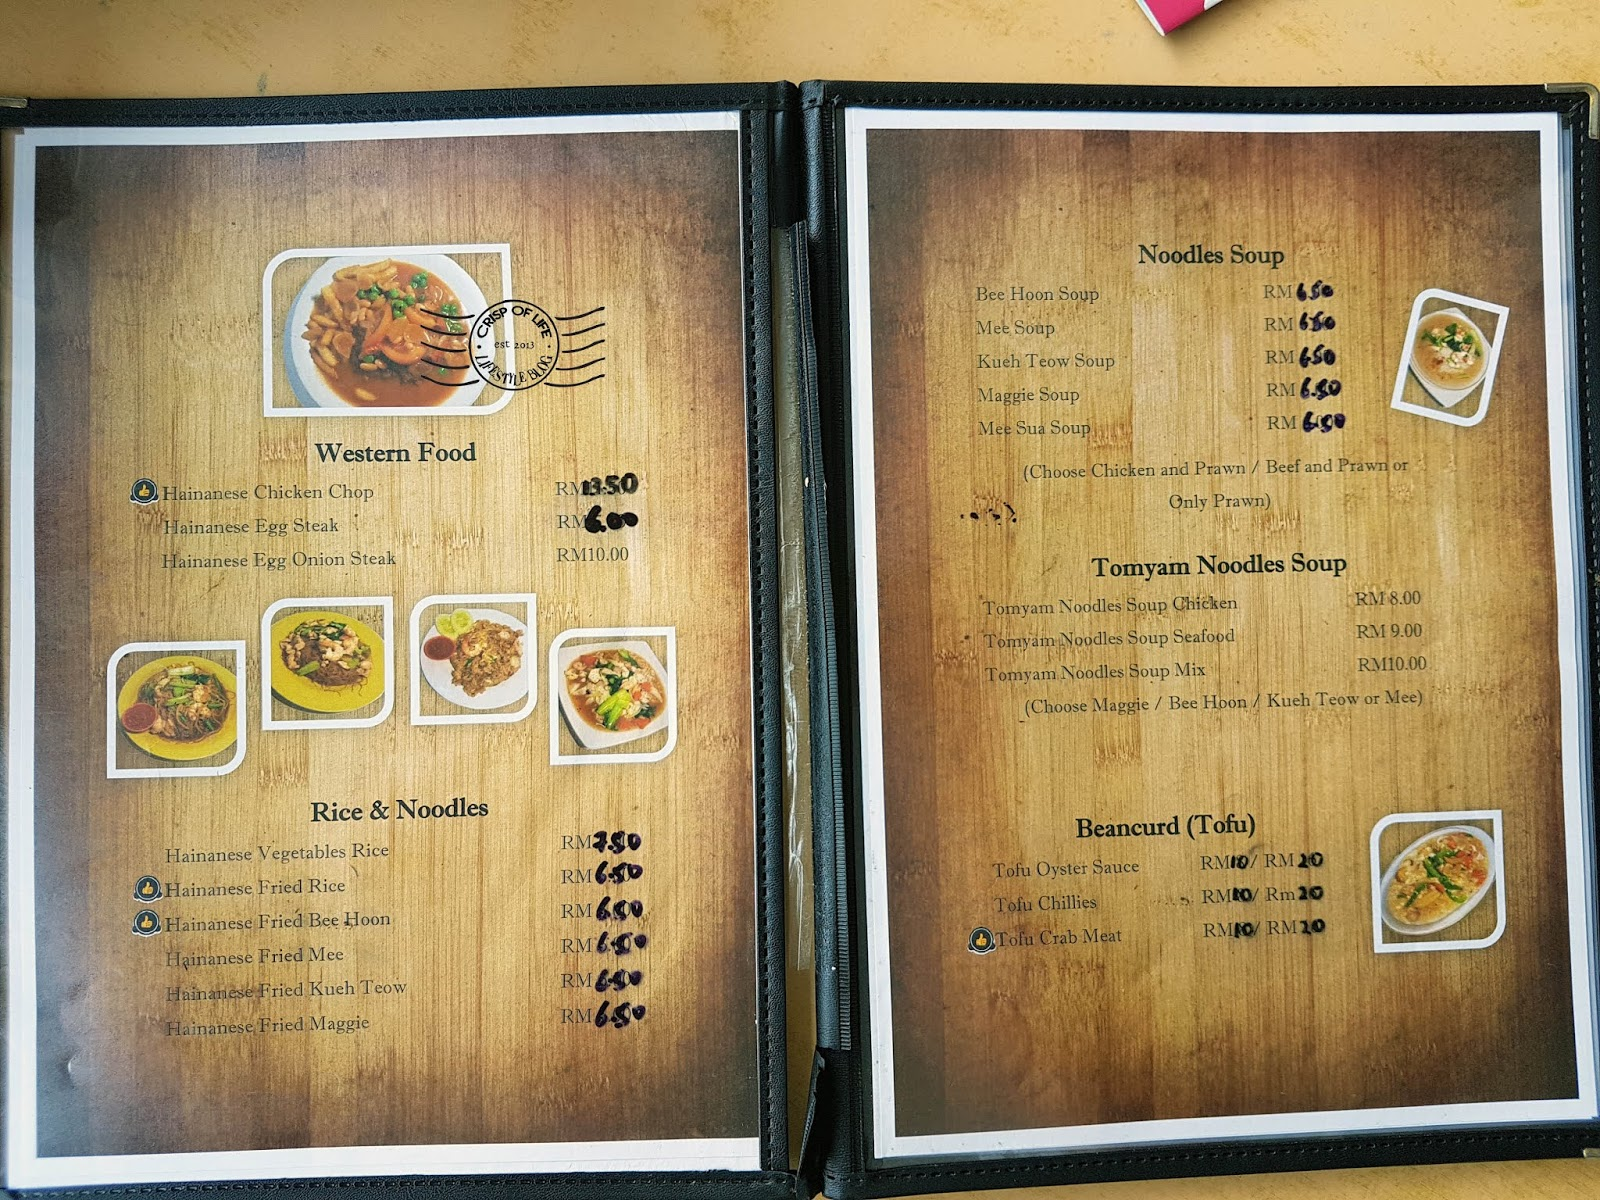 Sin Bee Chew Restaurant Hailam Food 新美州餐室海南餐 at Bagan Luar, Butterworth, Penang